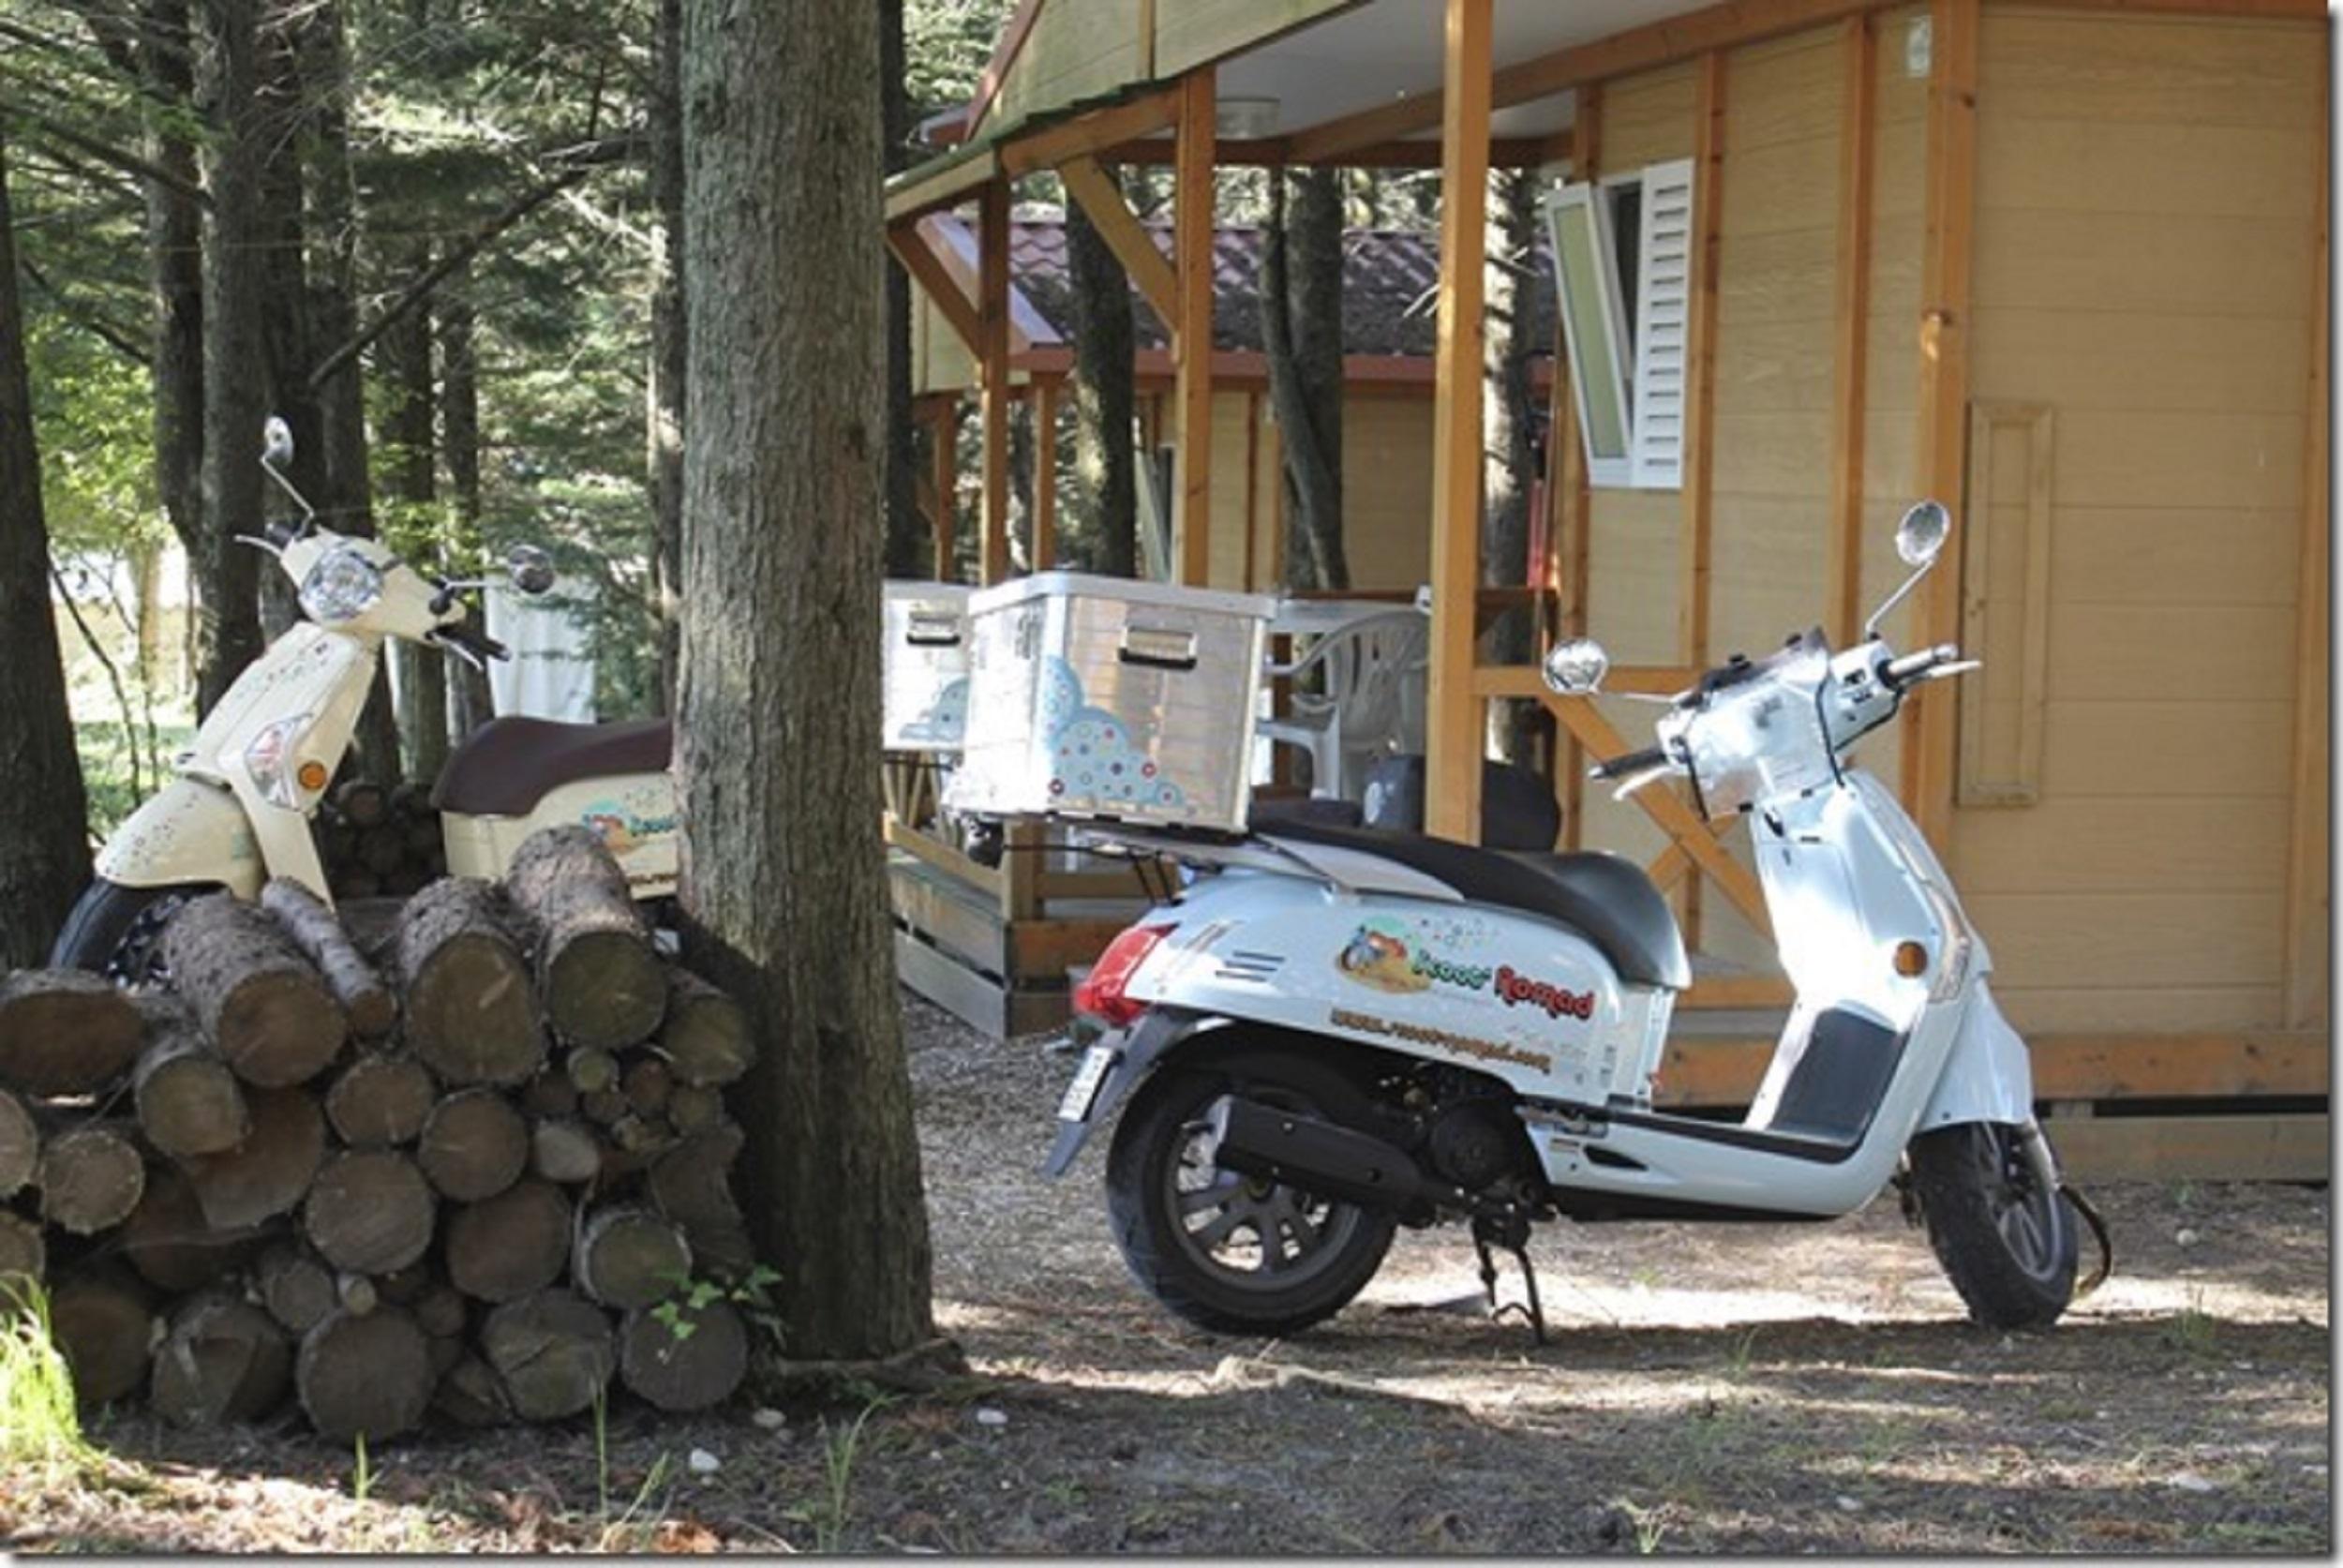 Scoot Nomad, balade insolite en scooter scooter tourisme en mobylette drome